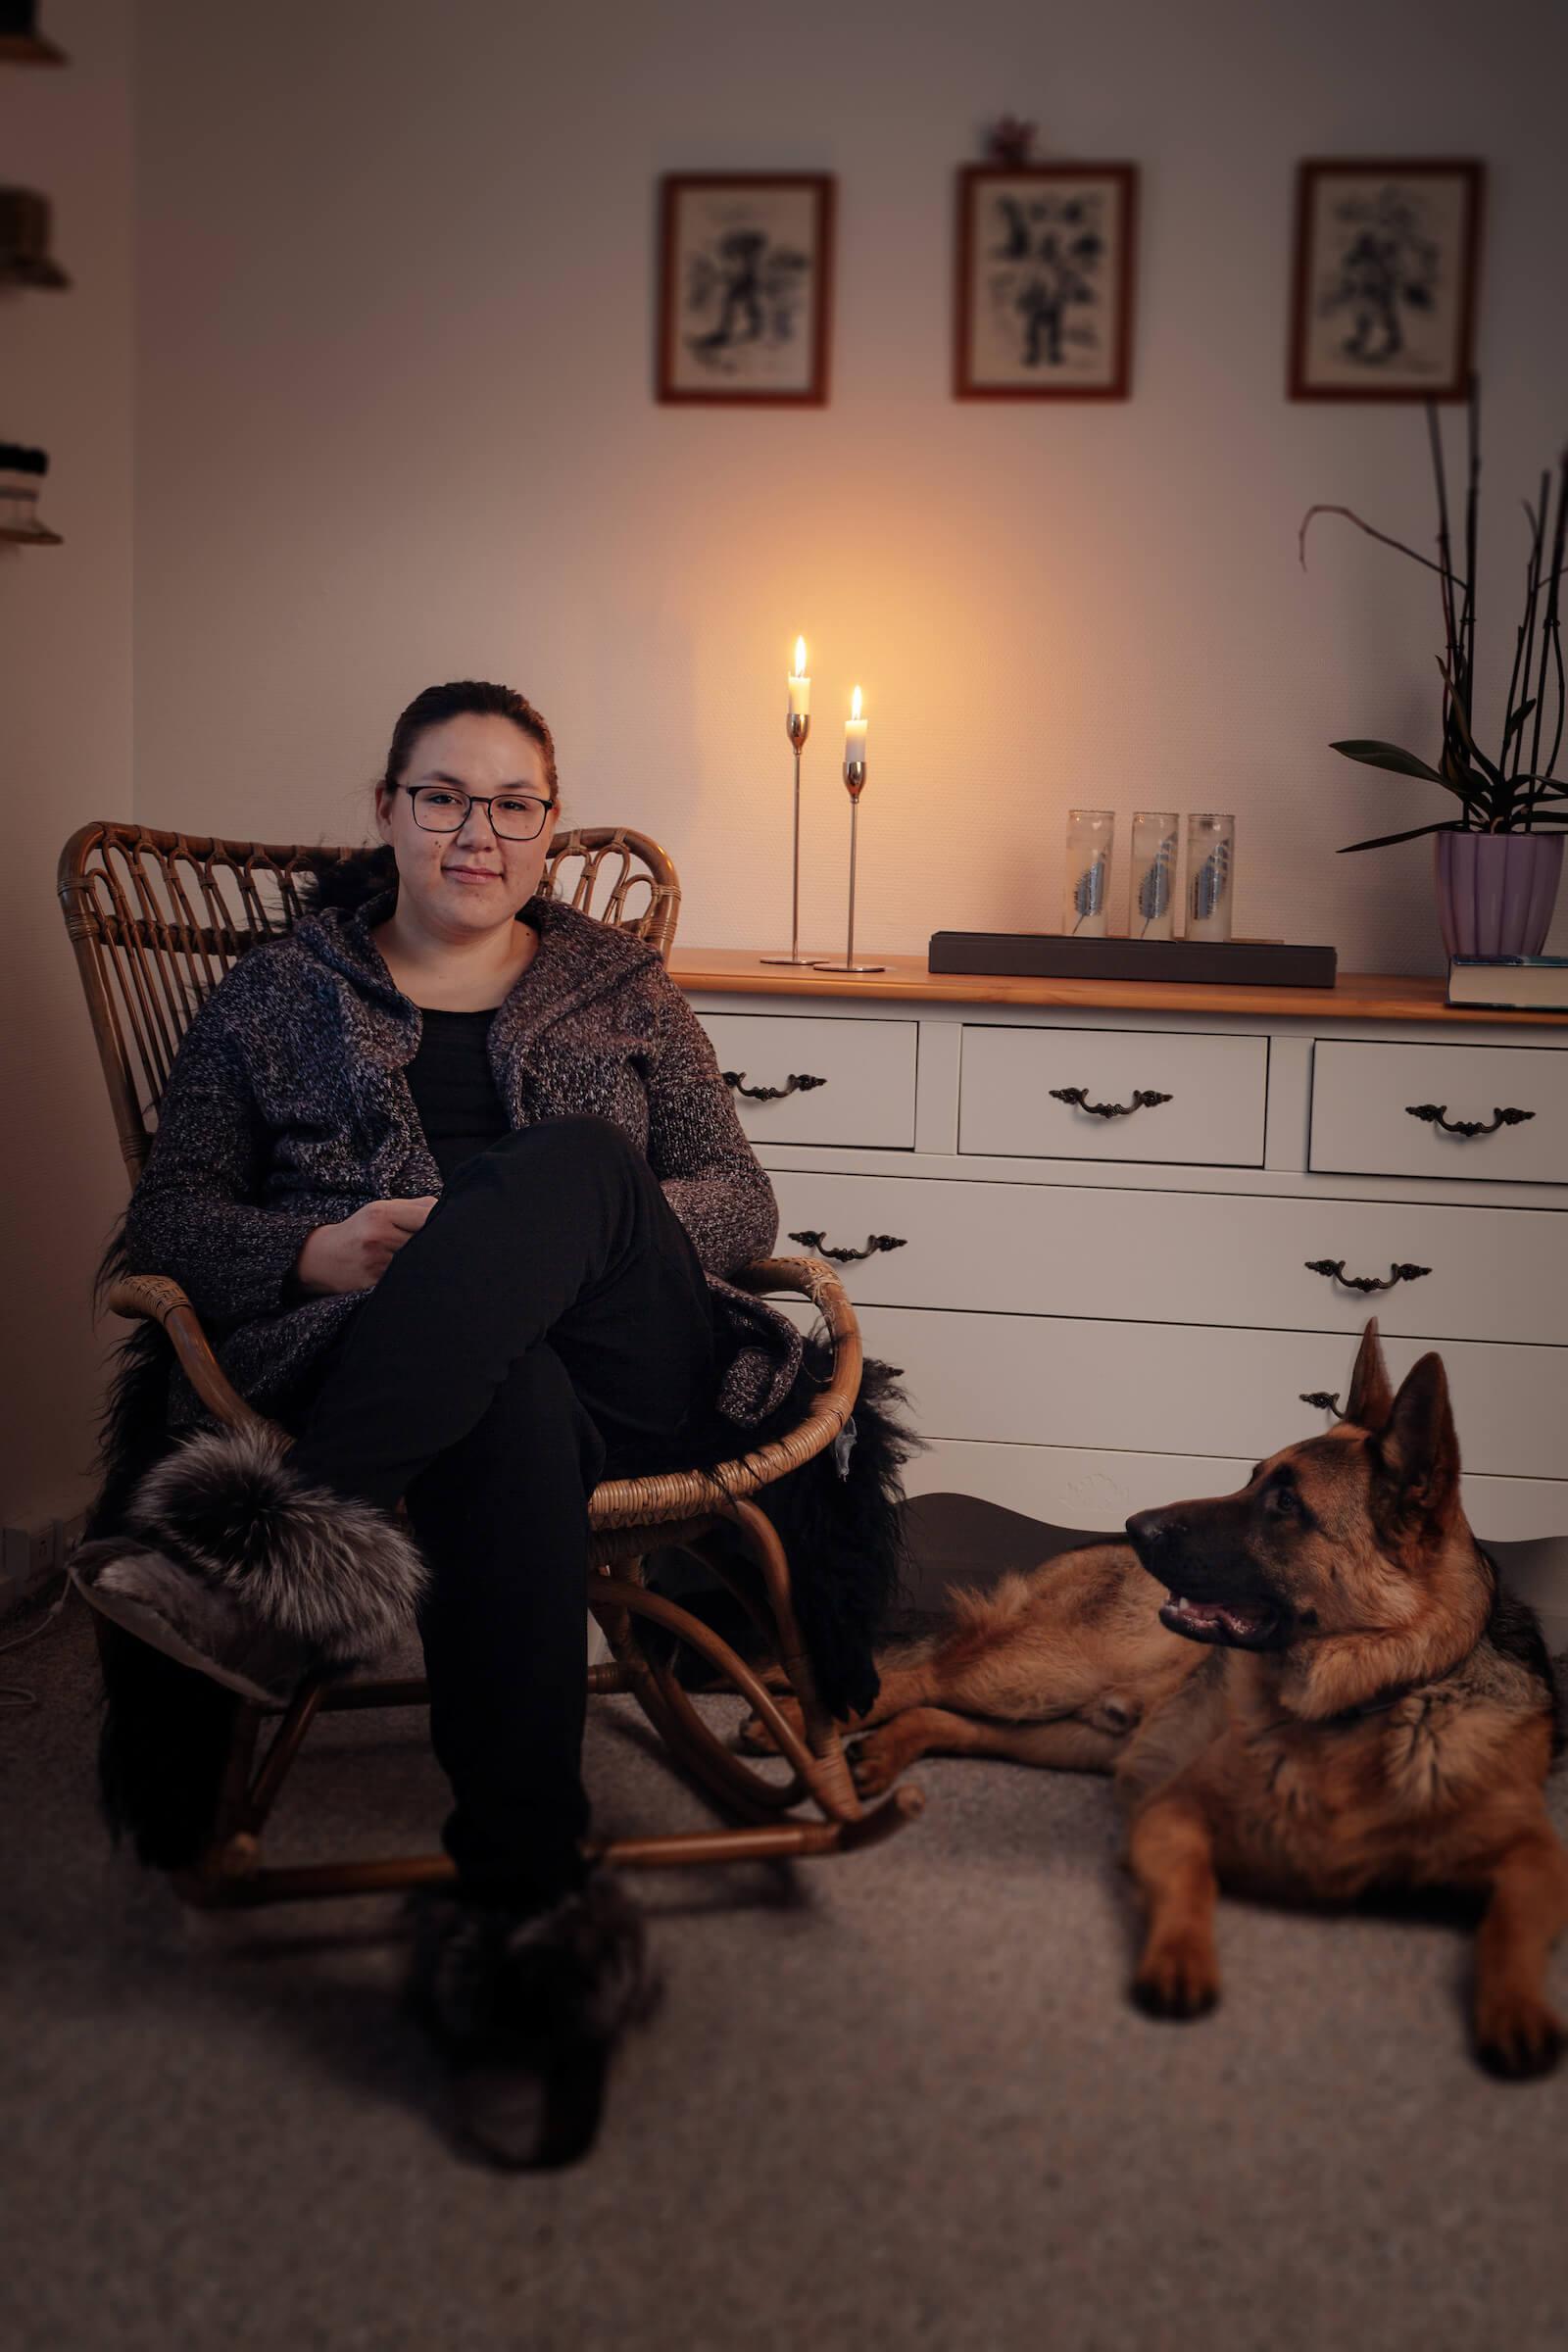 portrait of the greenlandic writer niviaq korneliussen in her home rh visitgreenland com in her new home in her home country kira had